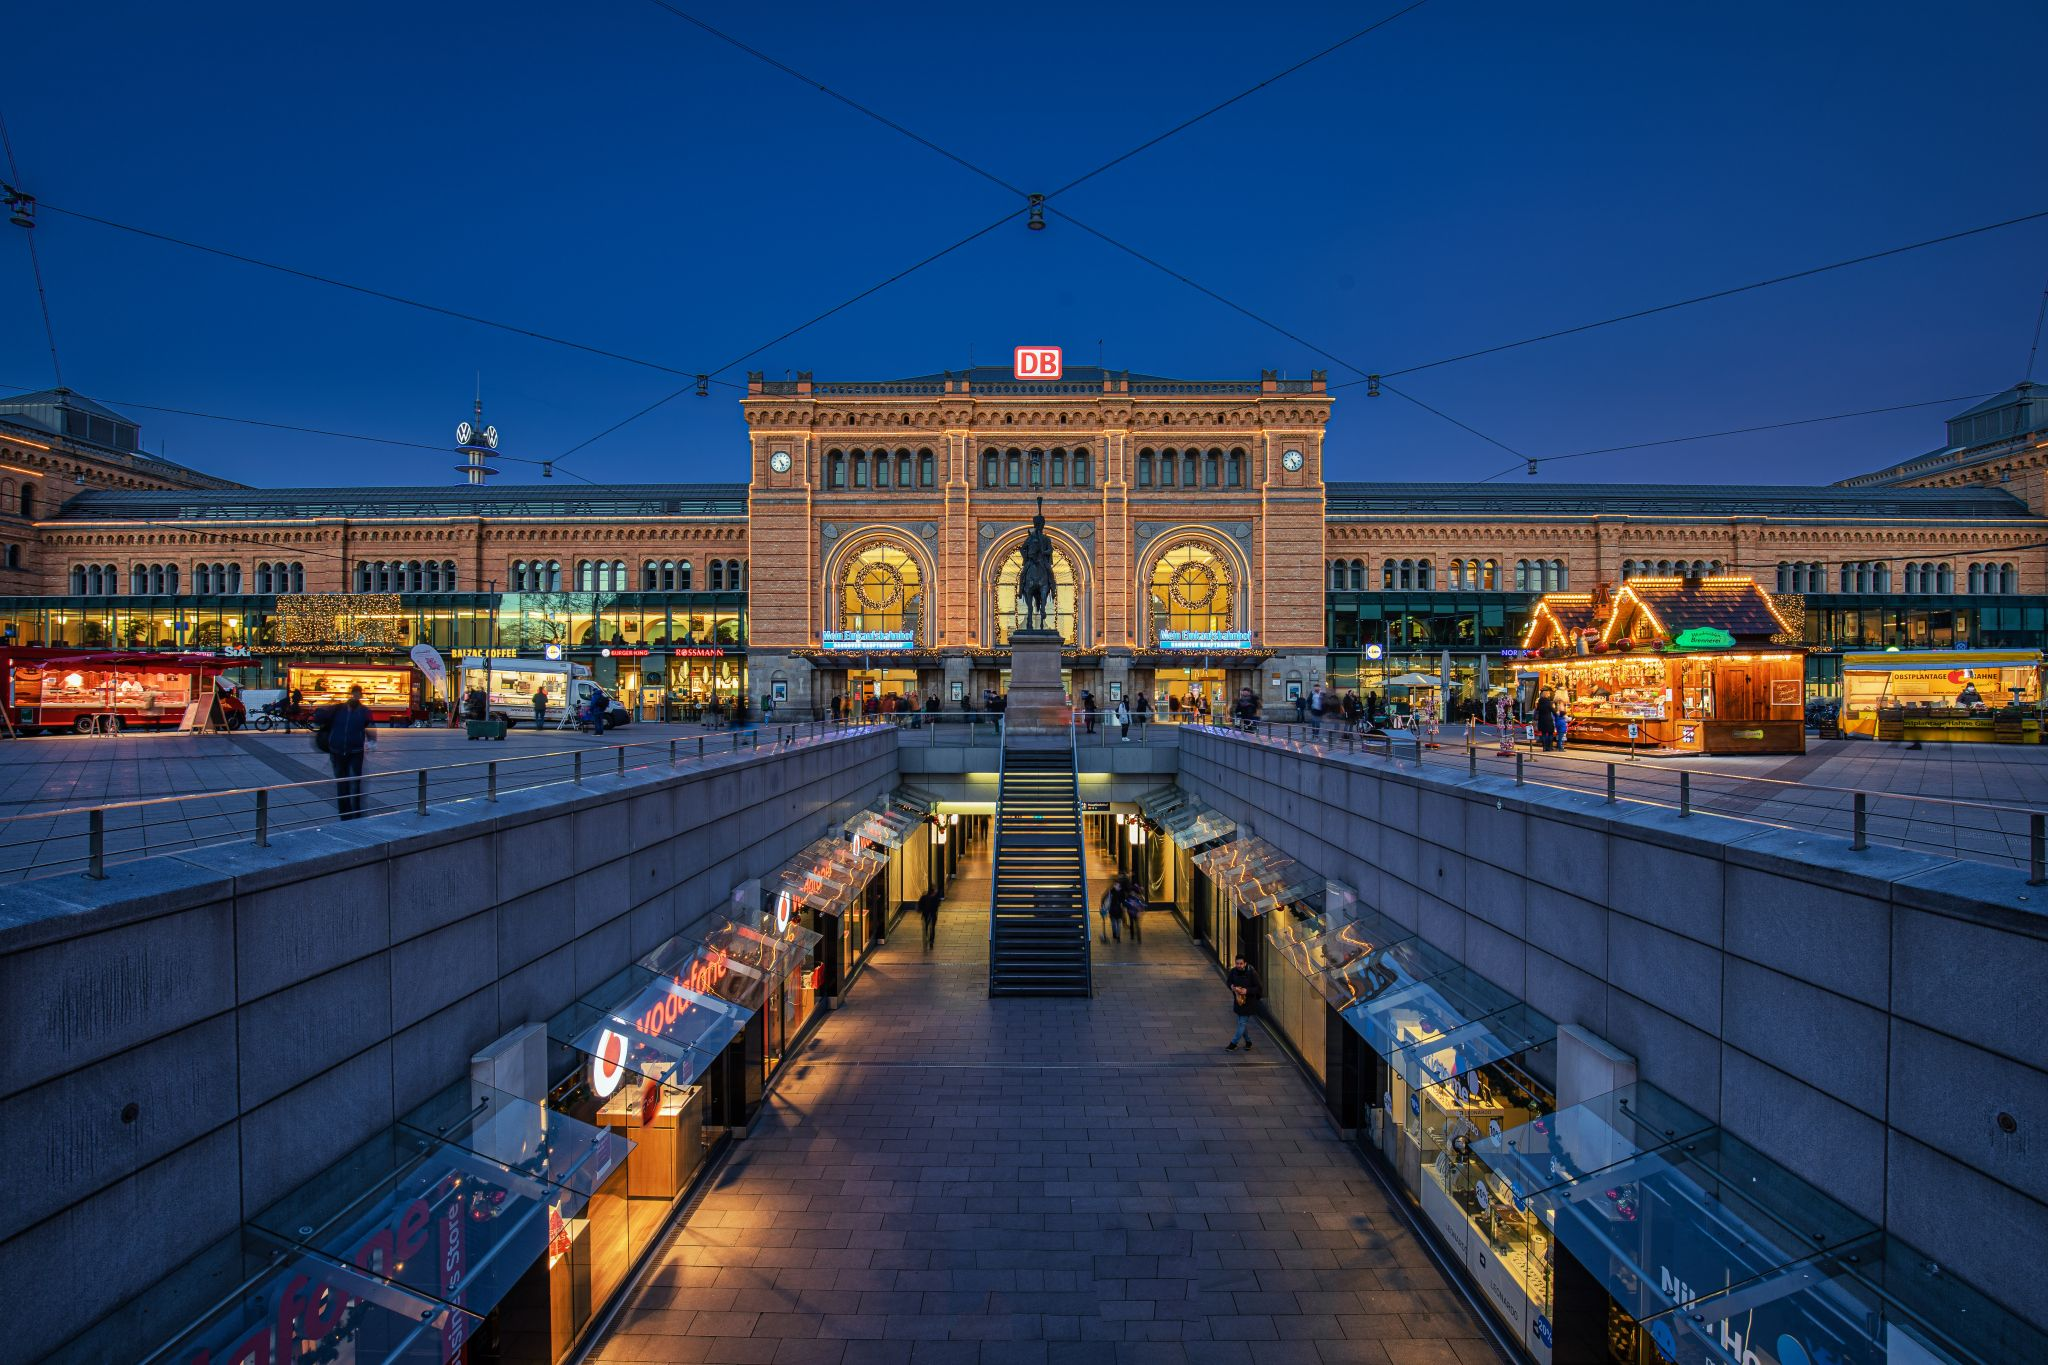 Hauptbahnhof Hannover, Germany